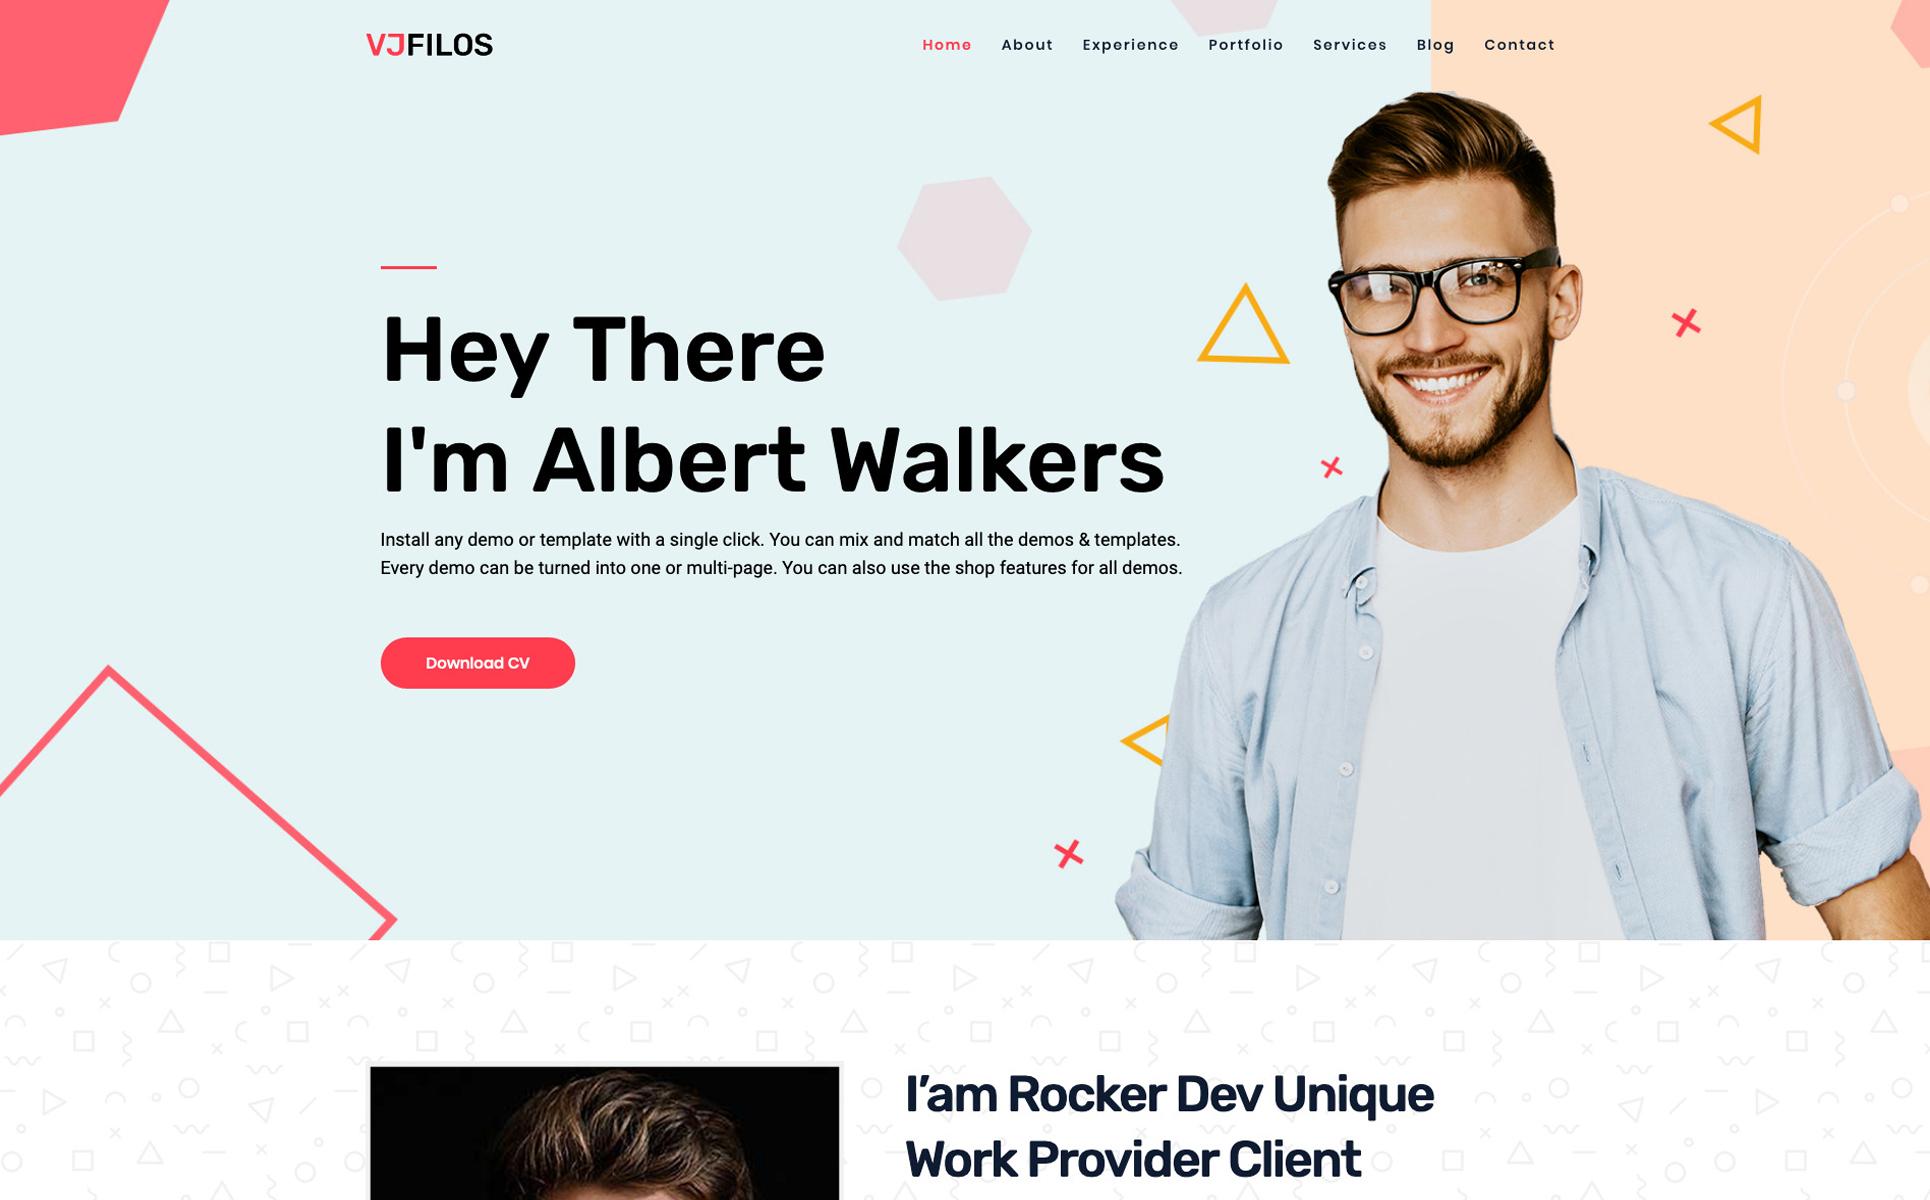 Vjflios - Portfolios and Personal CV Landingpage WordPress Theme